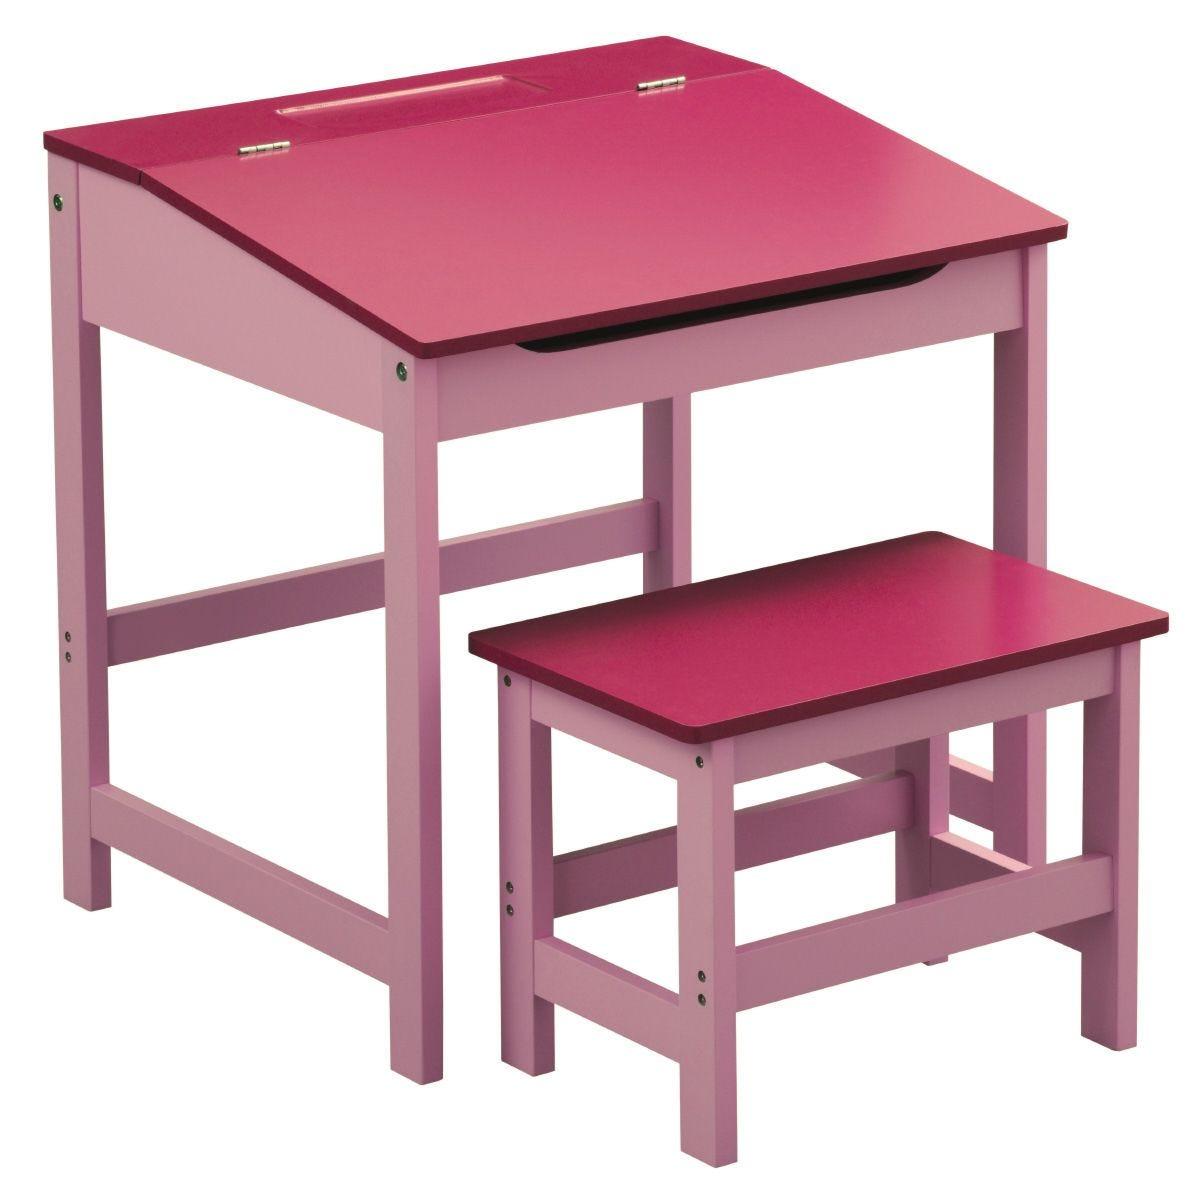 Kids Desk & Stool - Pink